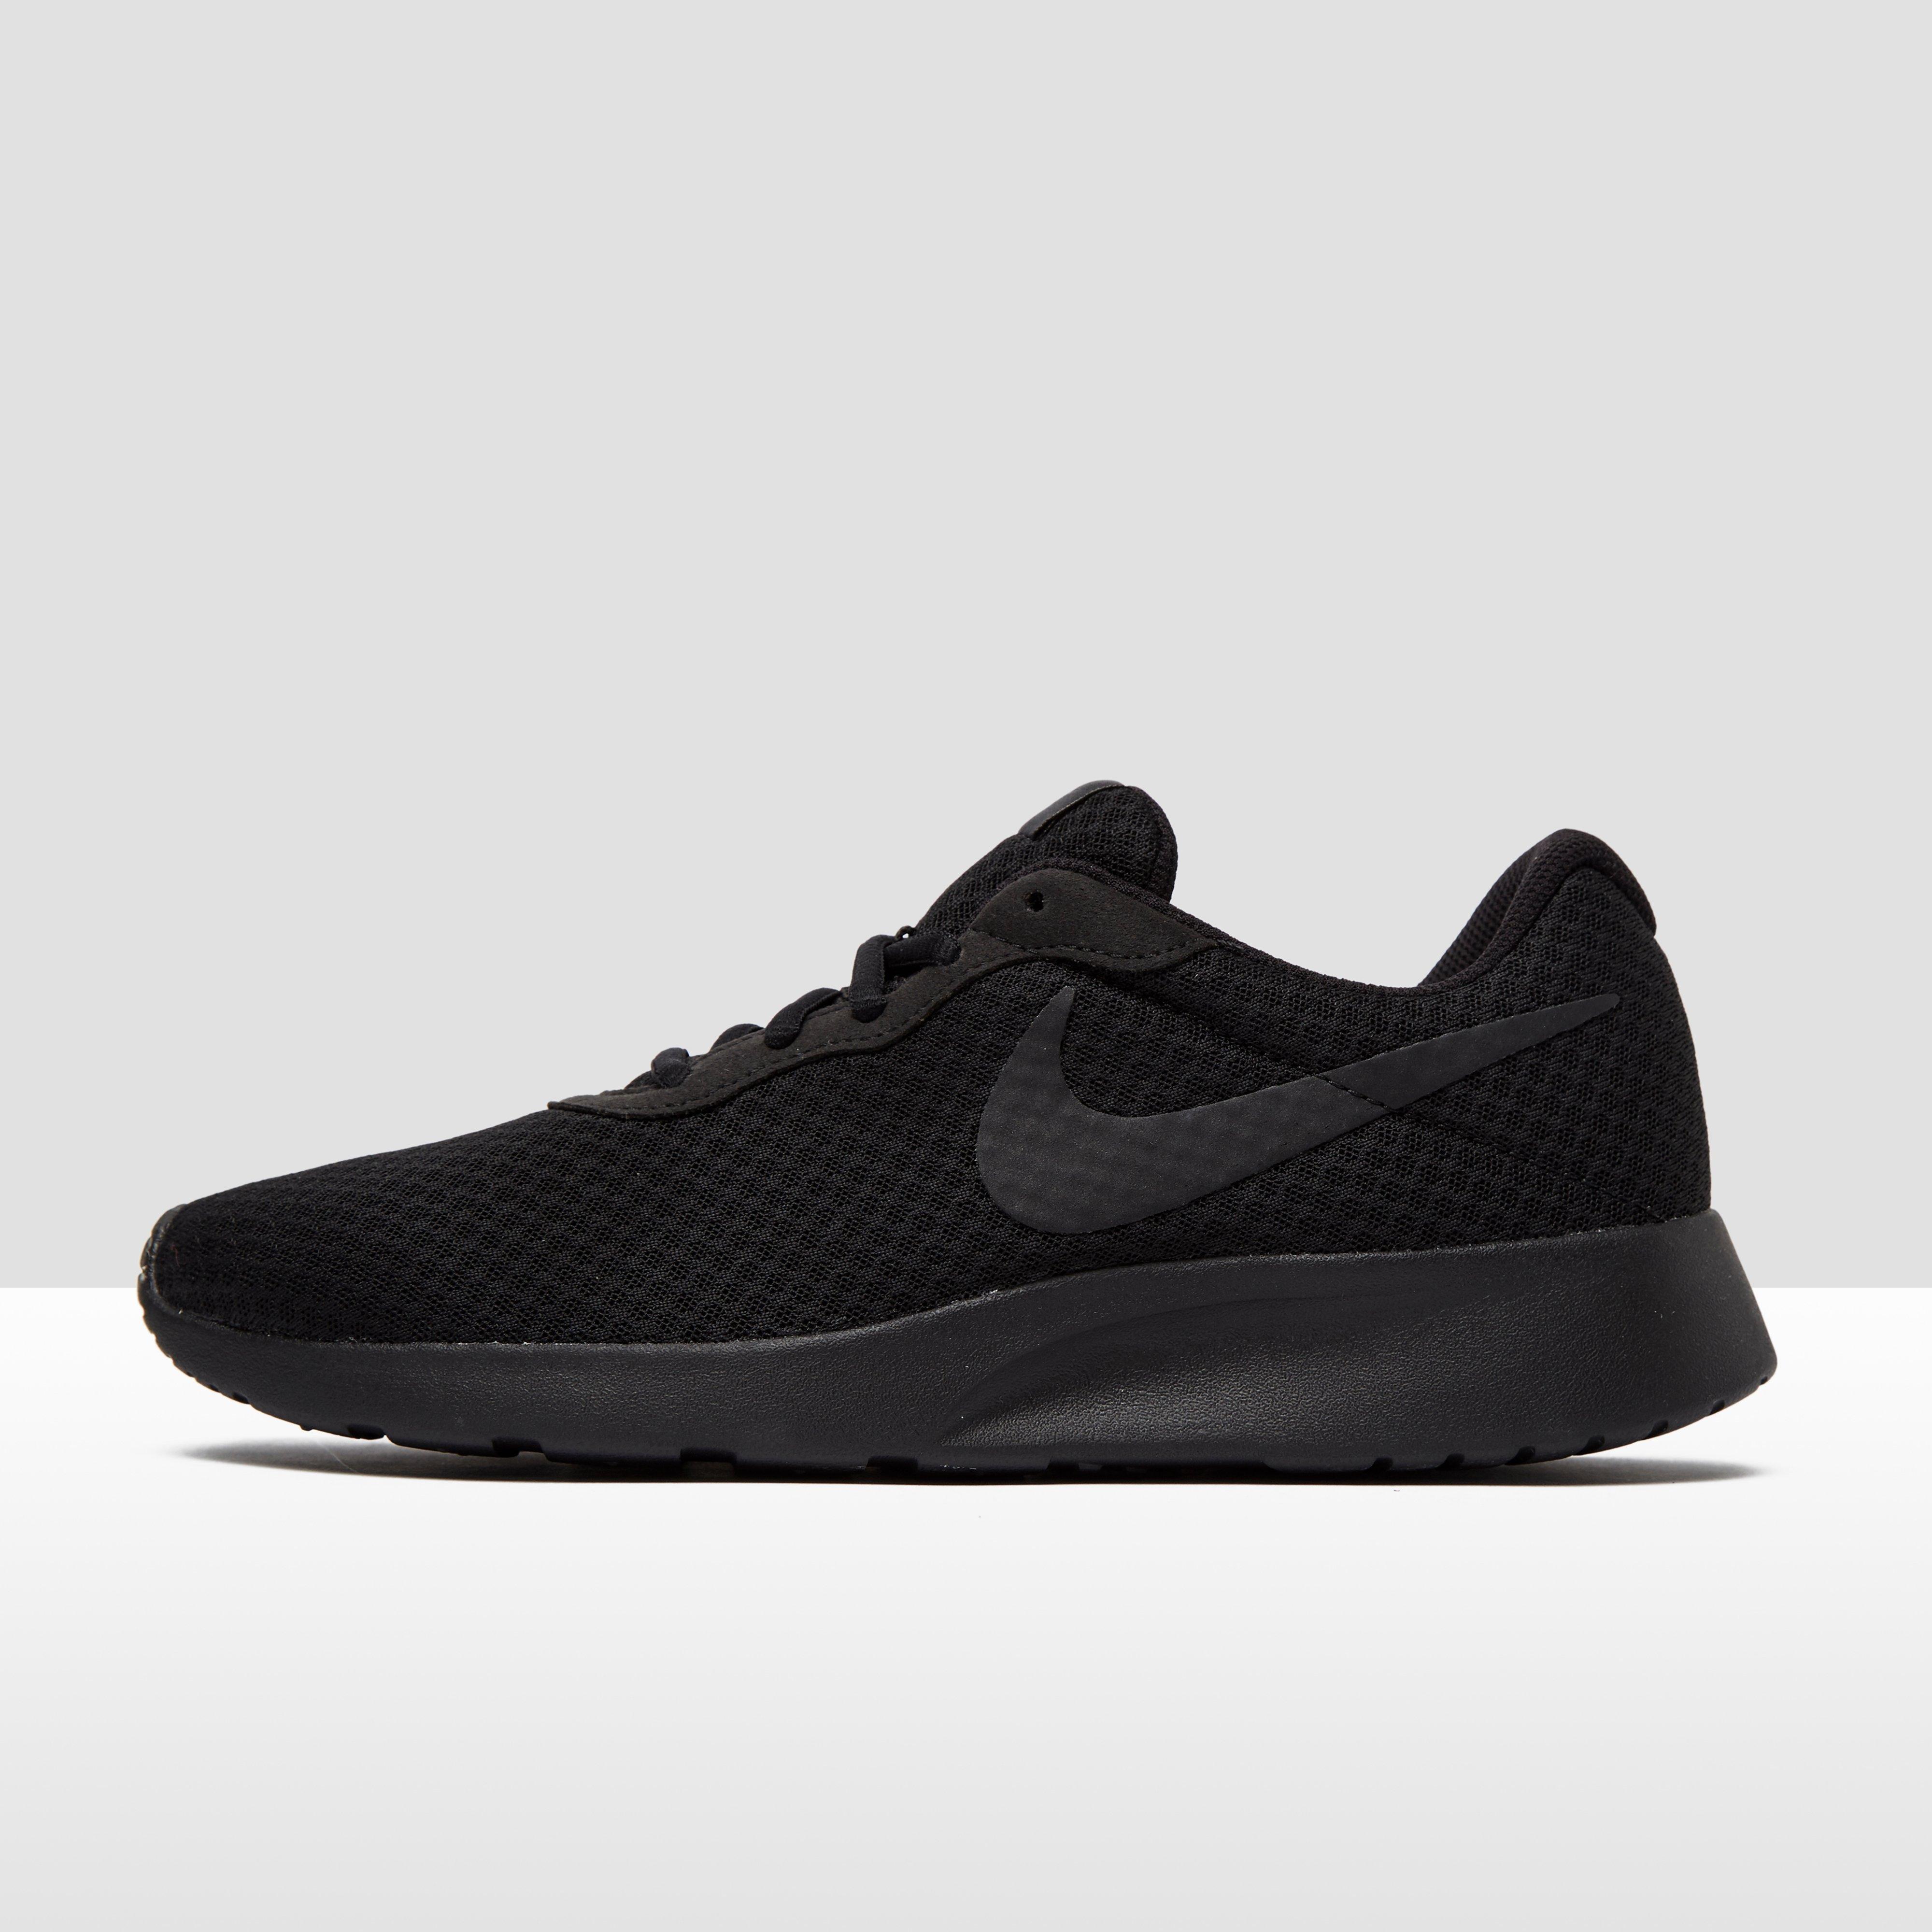 Chaussures Nike Noir Dans 5 Hommes uPnpVa8IX4